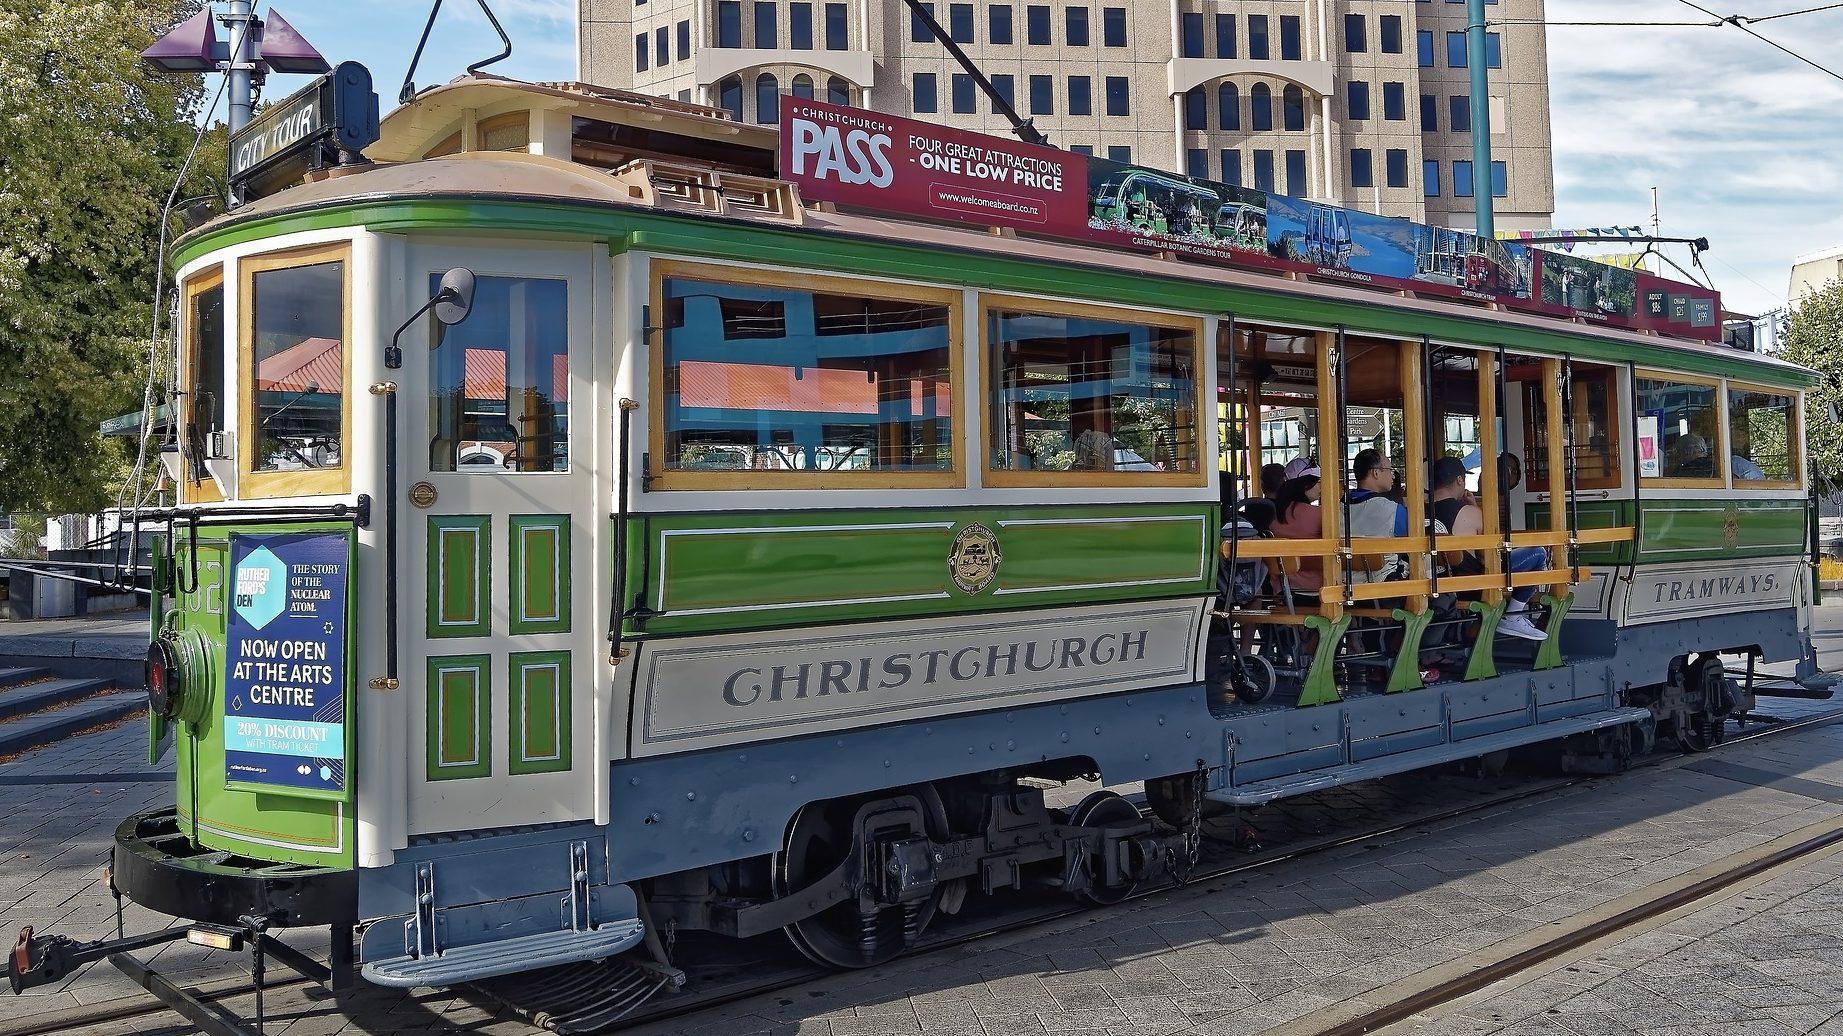 tram-3676686_1920